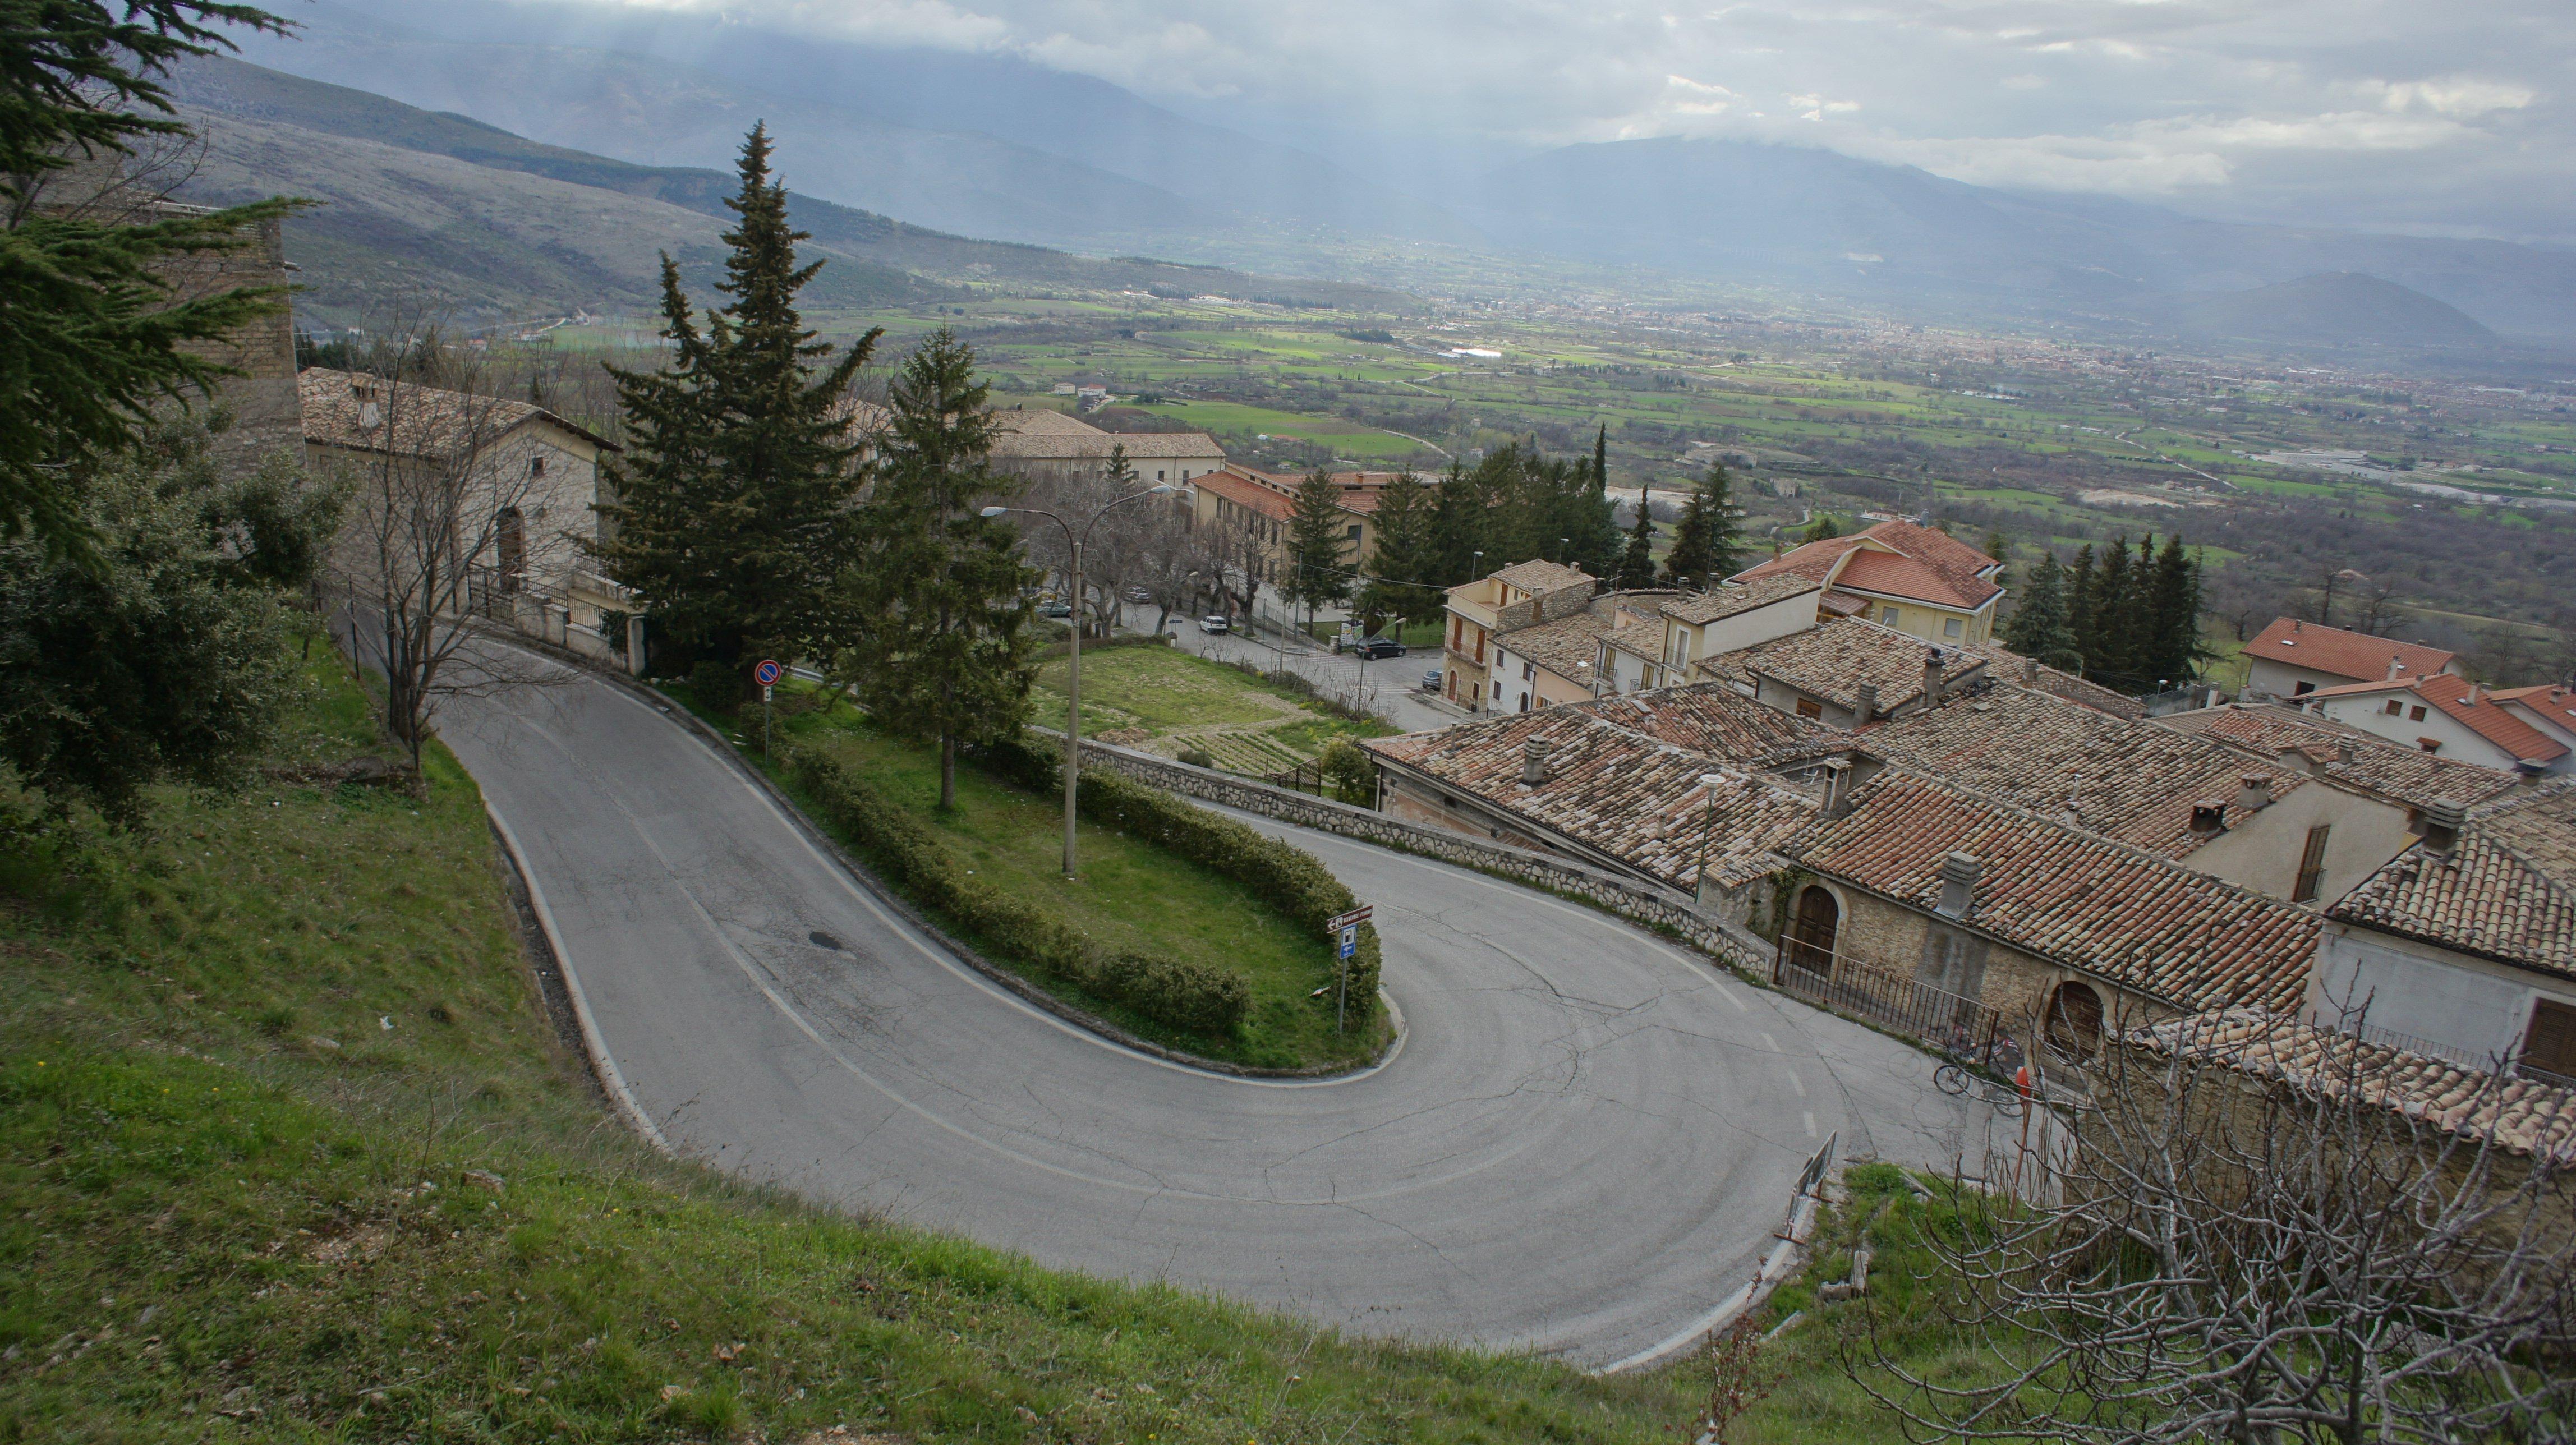 Pacentro | Pacentro Italy | Pacentro Abruzzo Italy